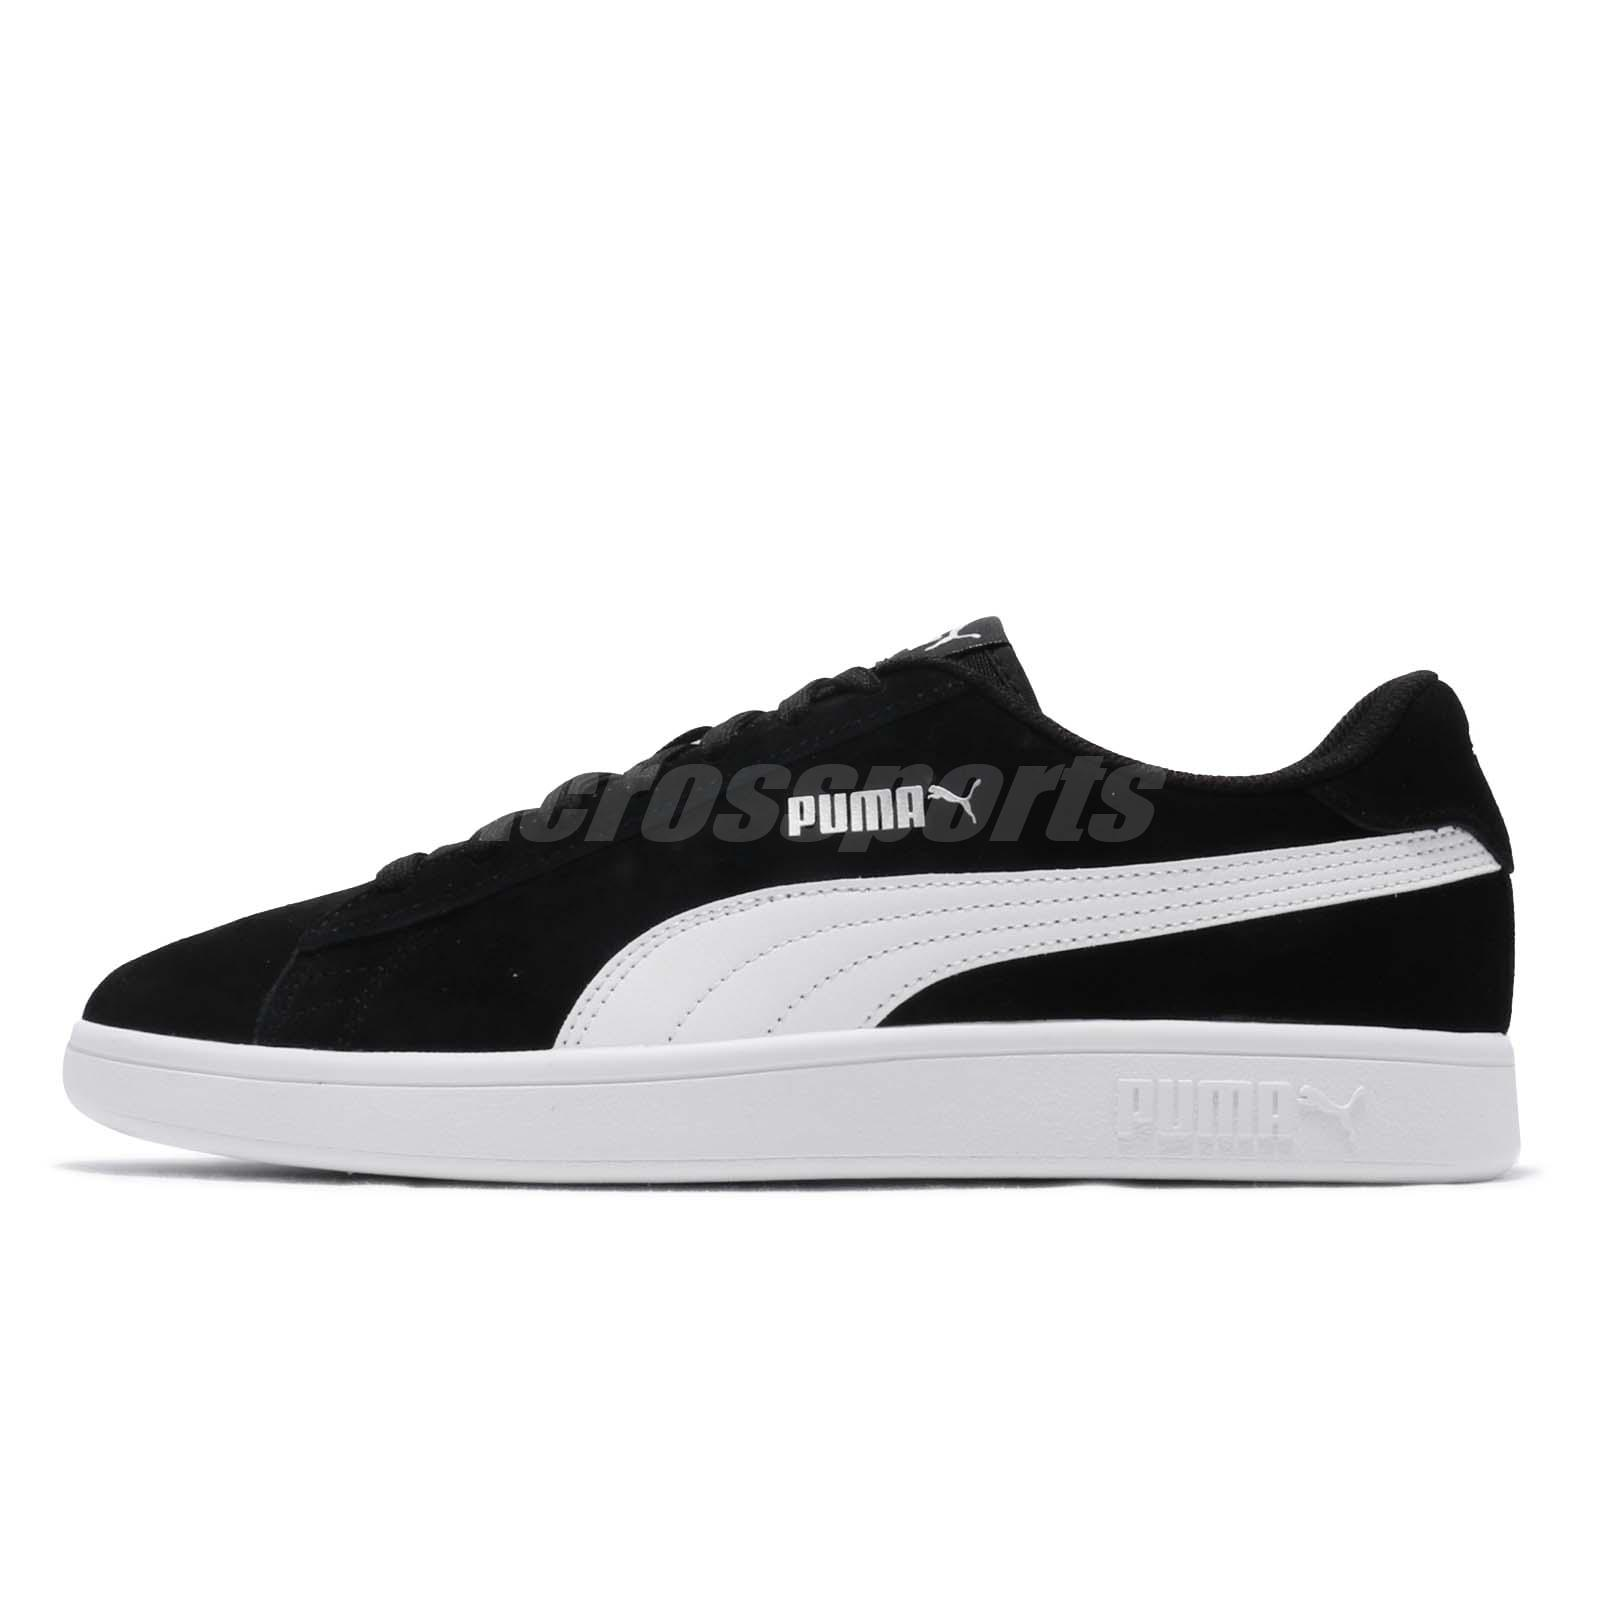 0a00b60ecb1e Puma Smash V2 Black White Silver Men Classic Casual Shoes Sneakers 364989-01